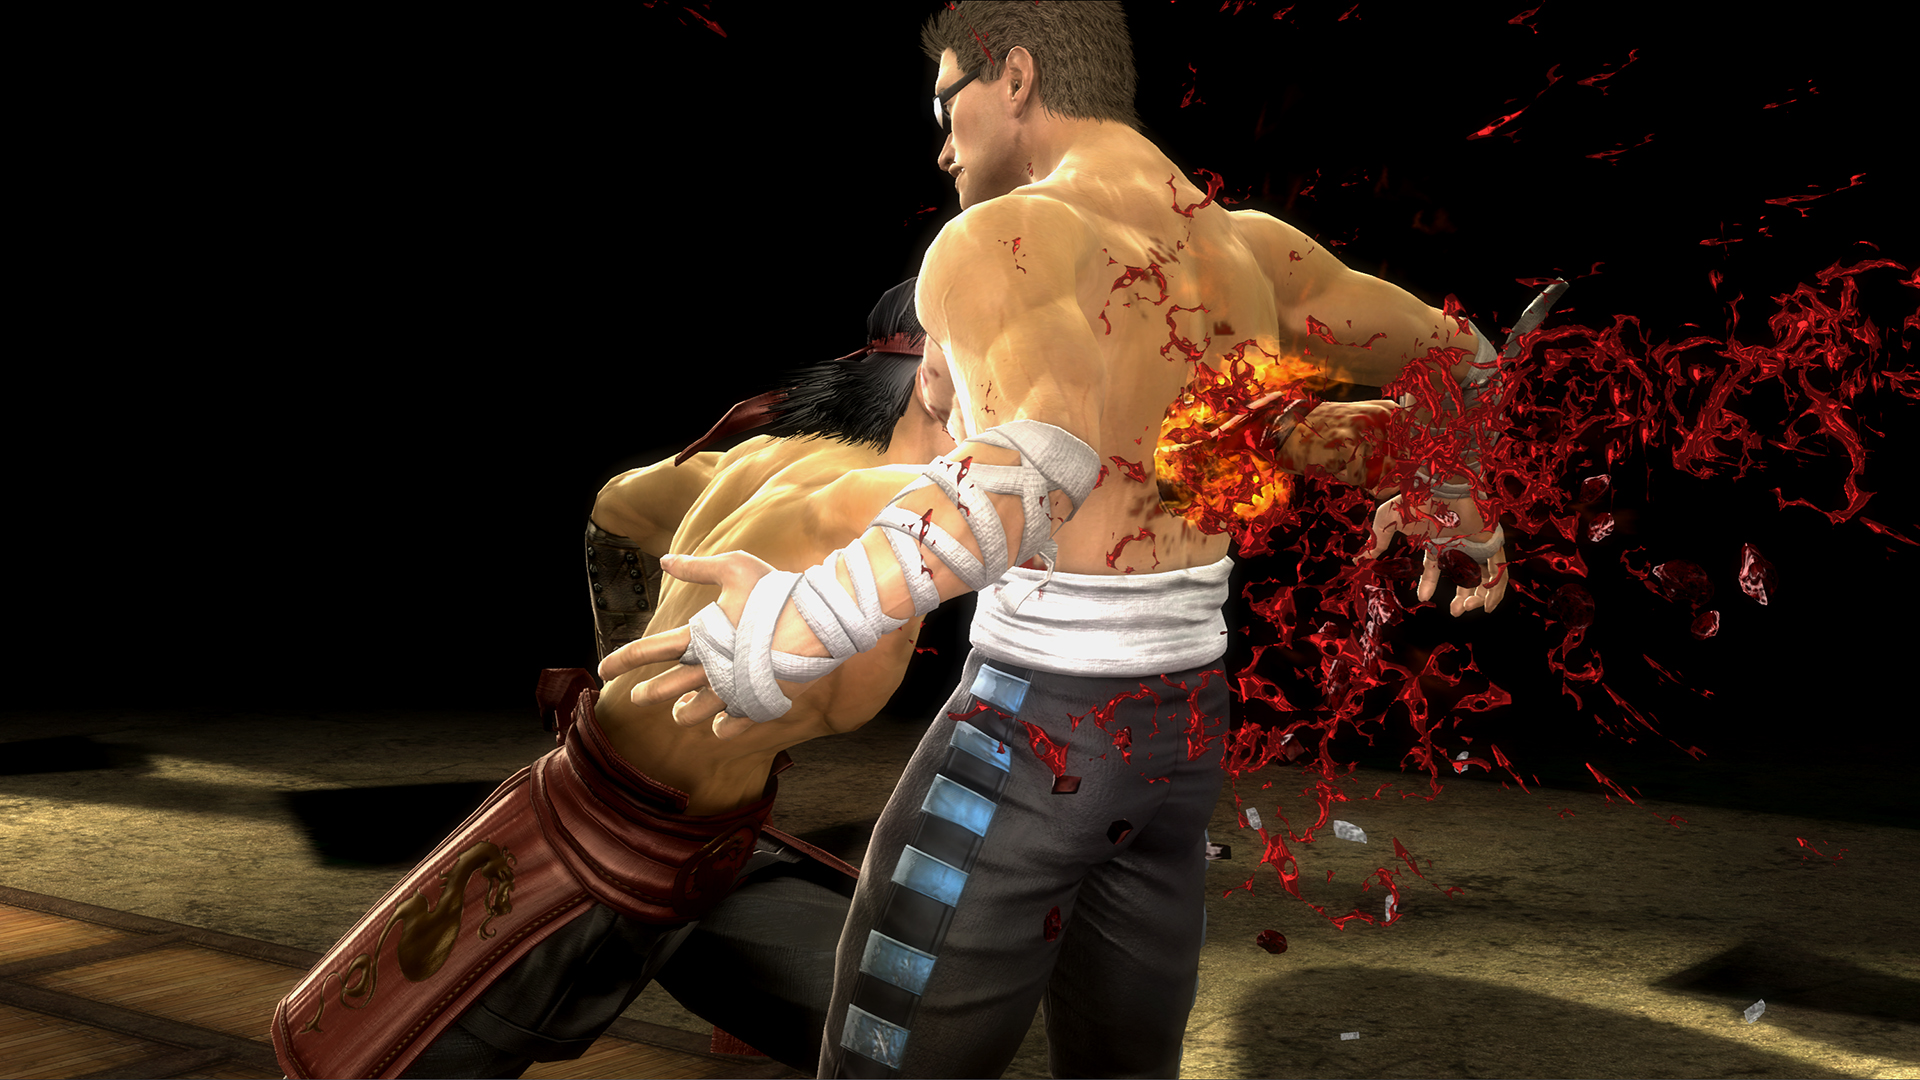 Mortal Kombat Komplete Edition (PC) |OT| A Warrior's Death